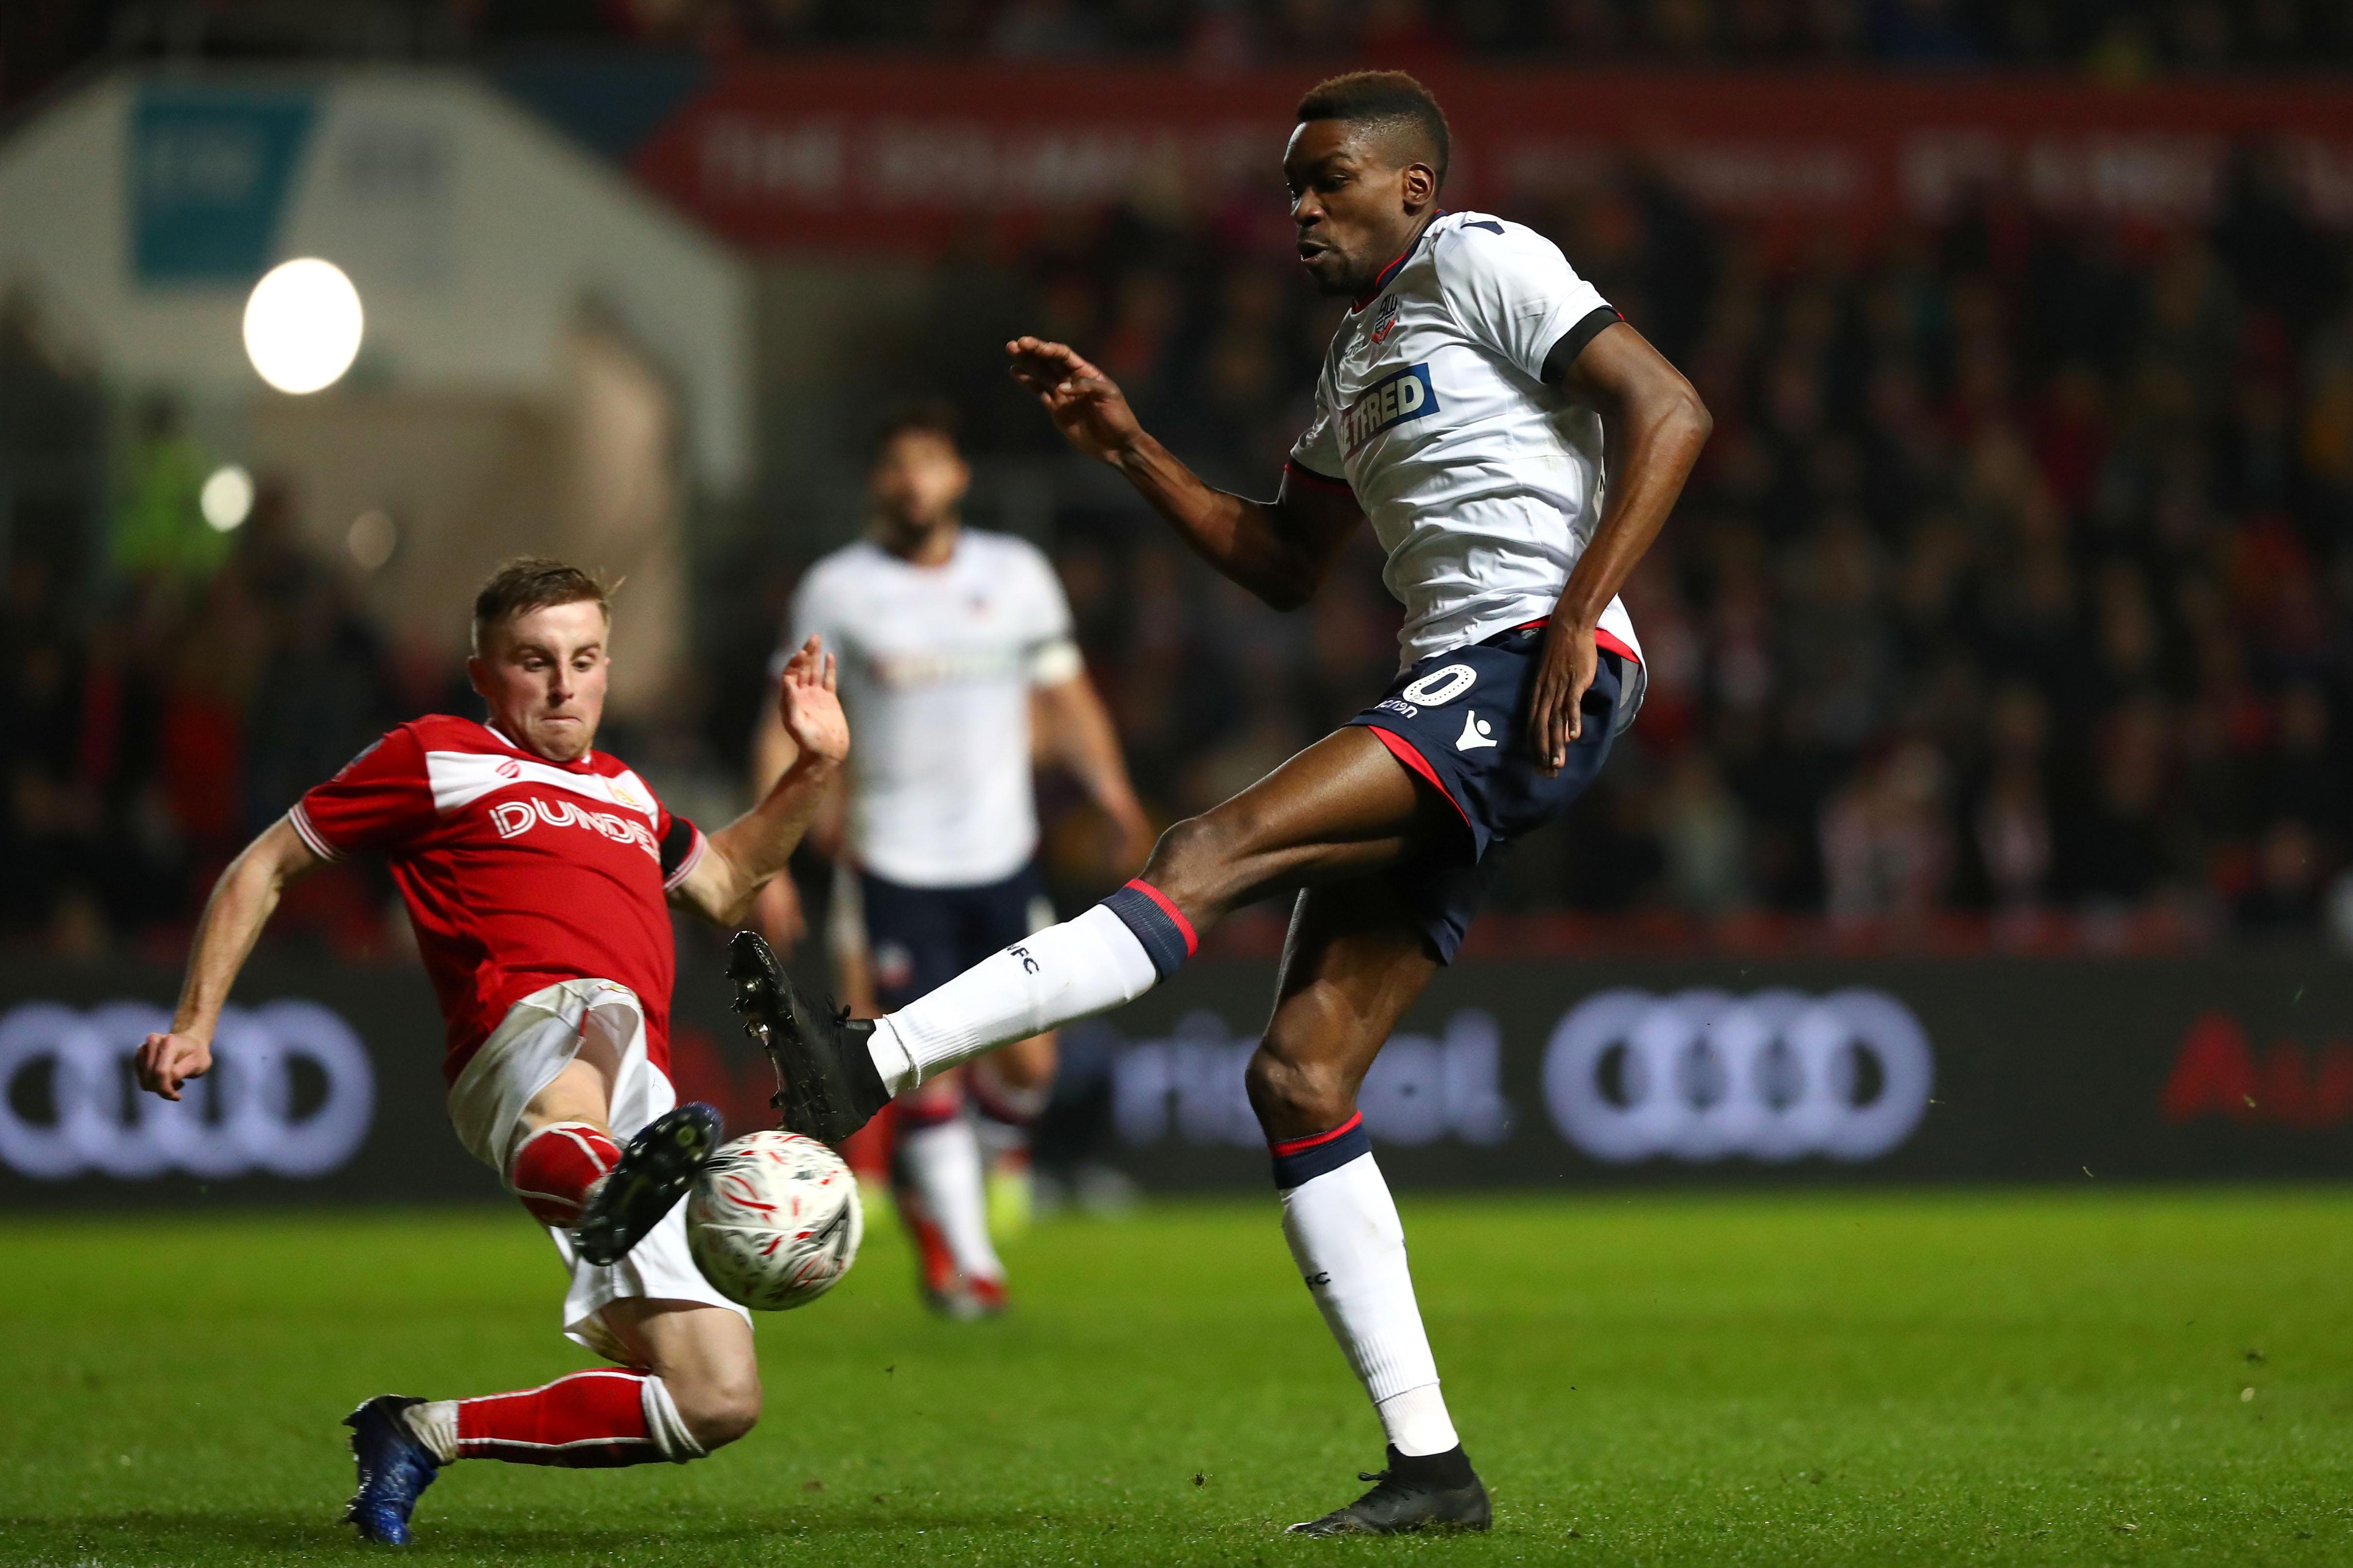 Bristol City v Bolton Wanderers - FA Cup Fourth Round